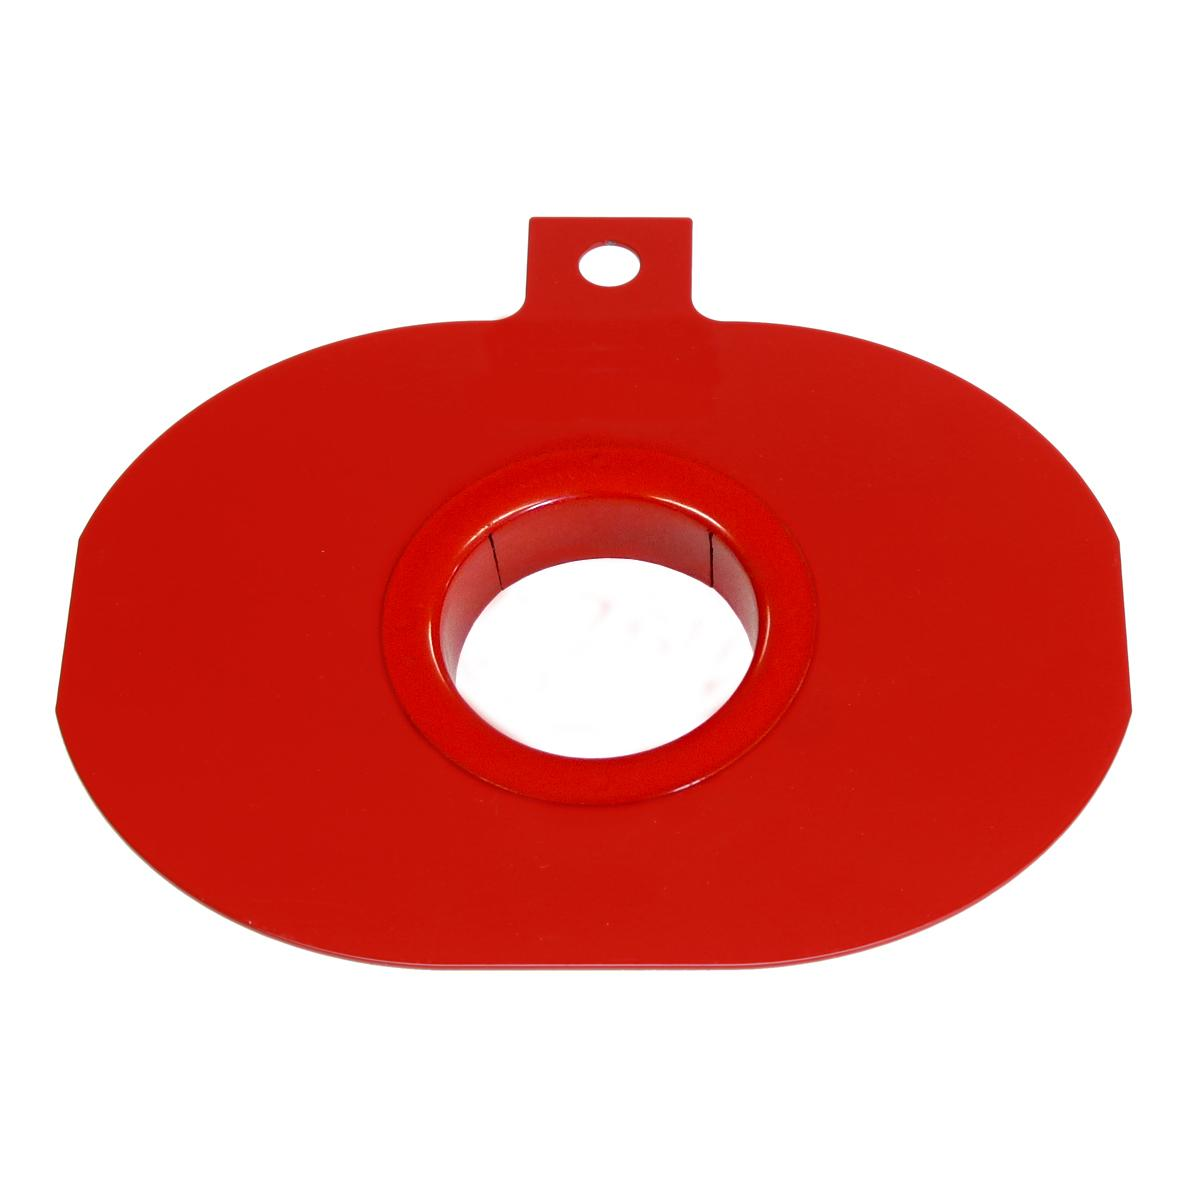 Itg jc20 baseplate 51jc20 from merlin motorsport for Motor base plate design